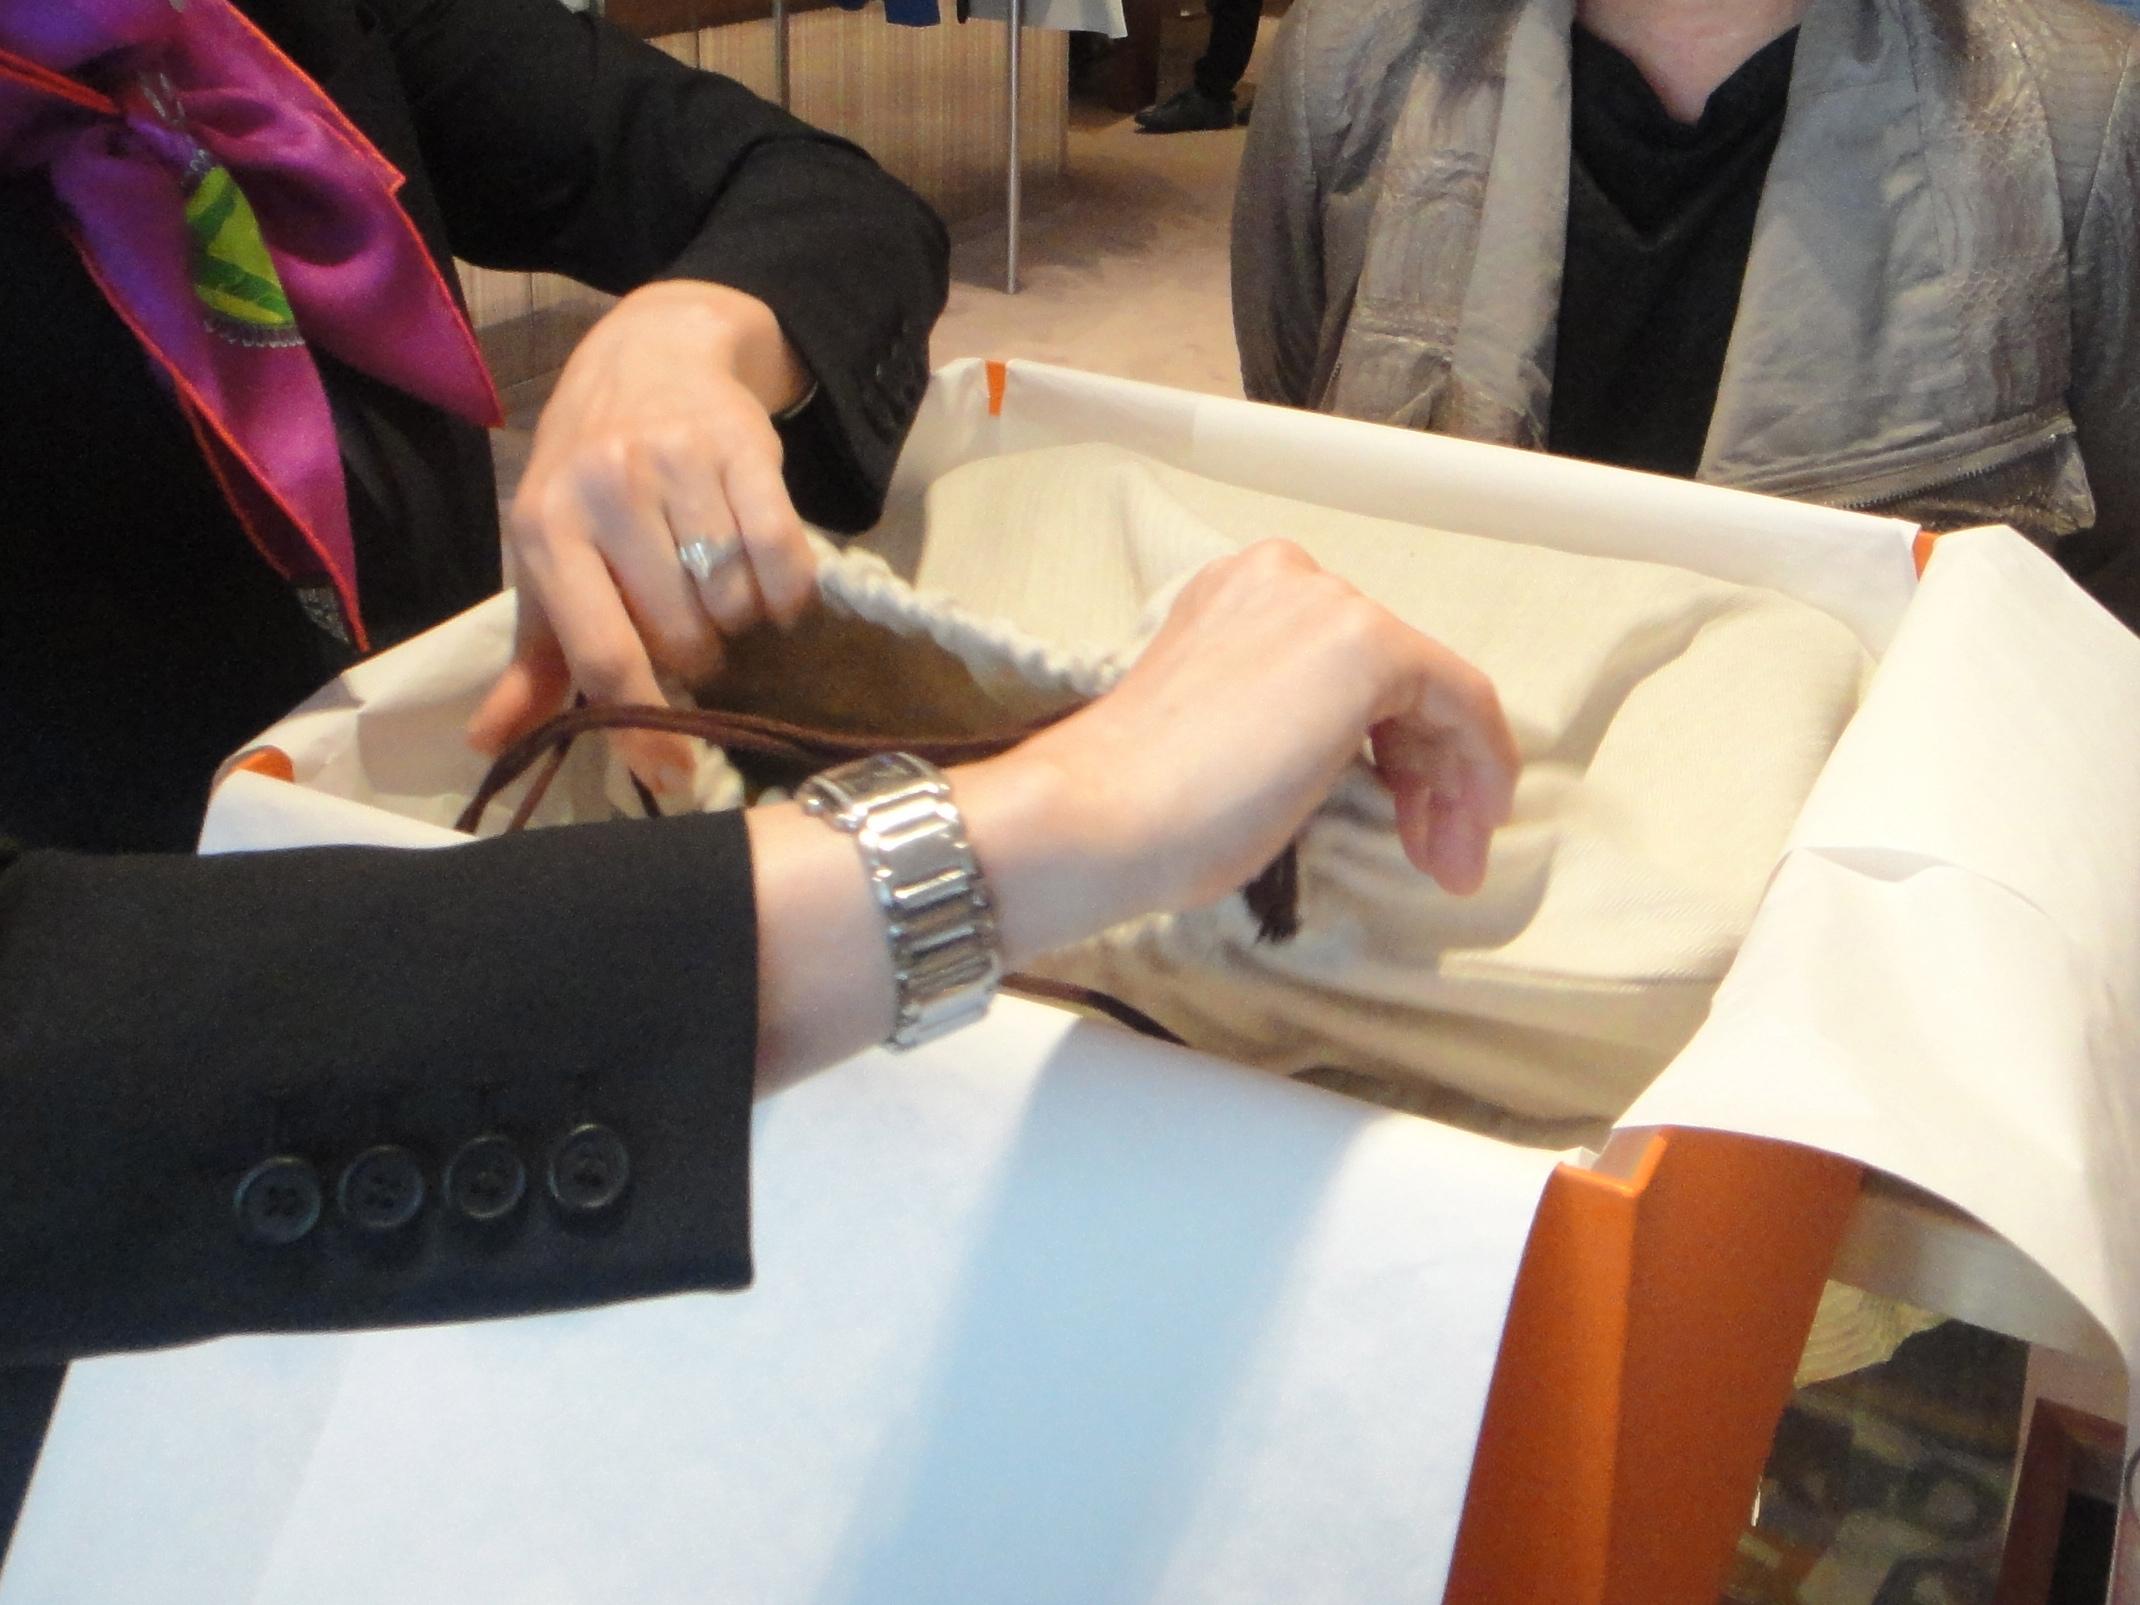 what's inside the dust bag? / Was befindet sich in dem Staubbeutel?